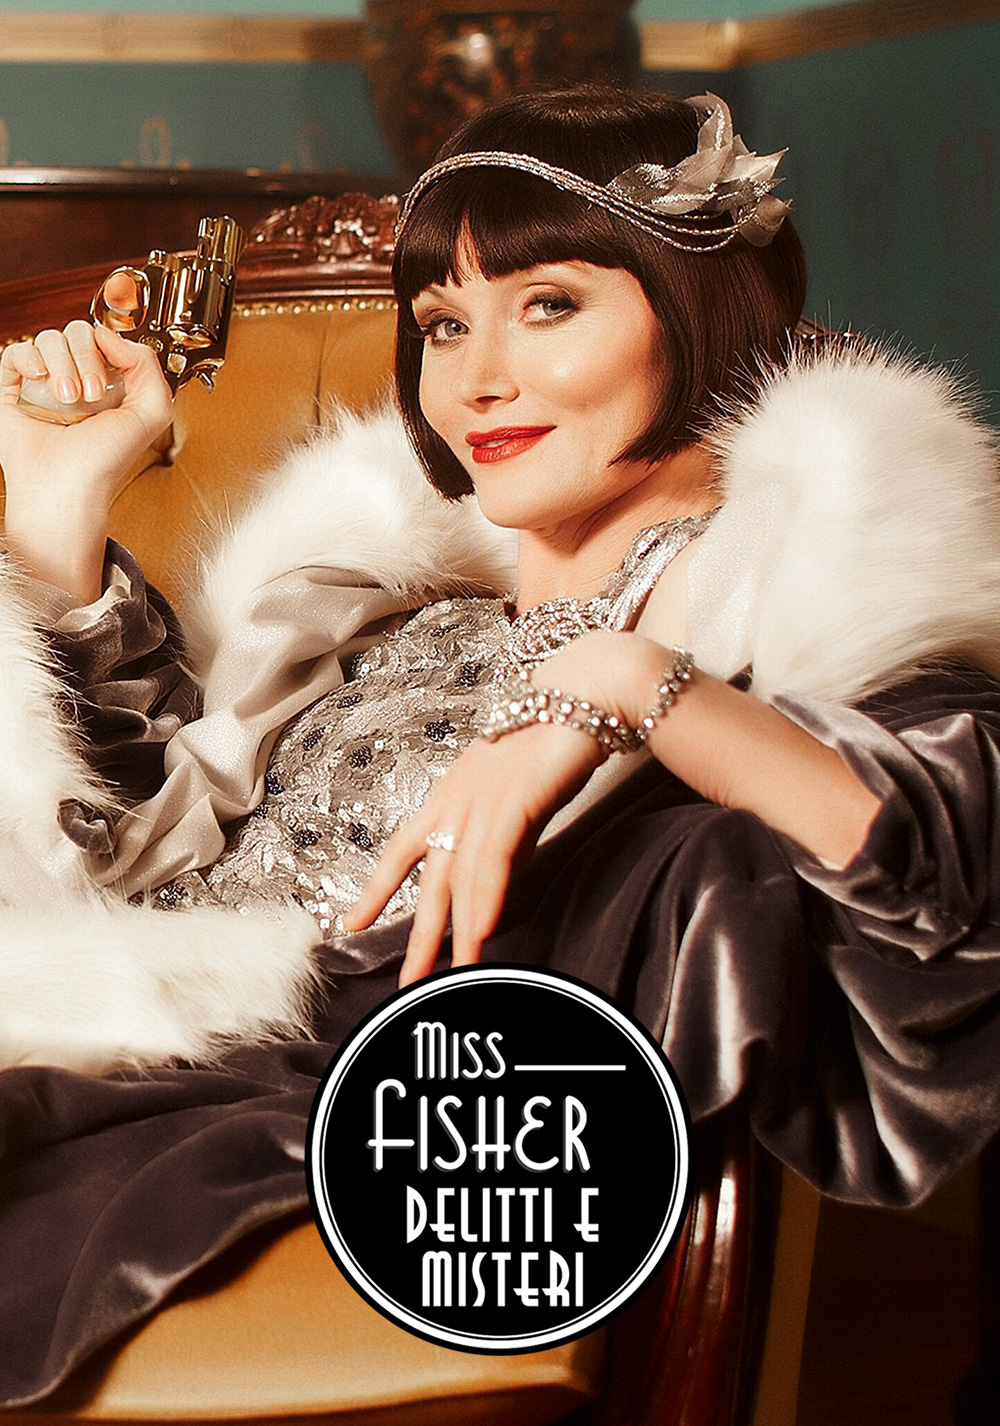 Мистериите на мис Фишър Сезони 1-3